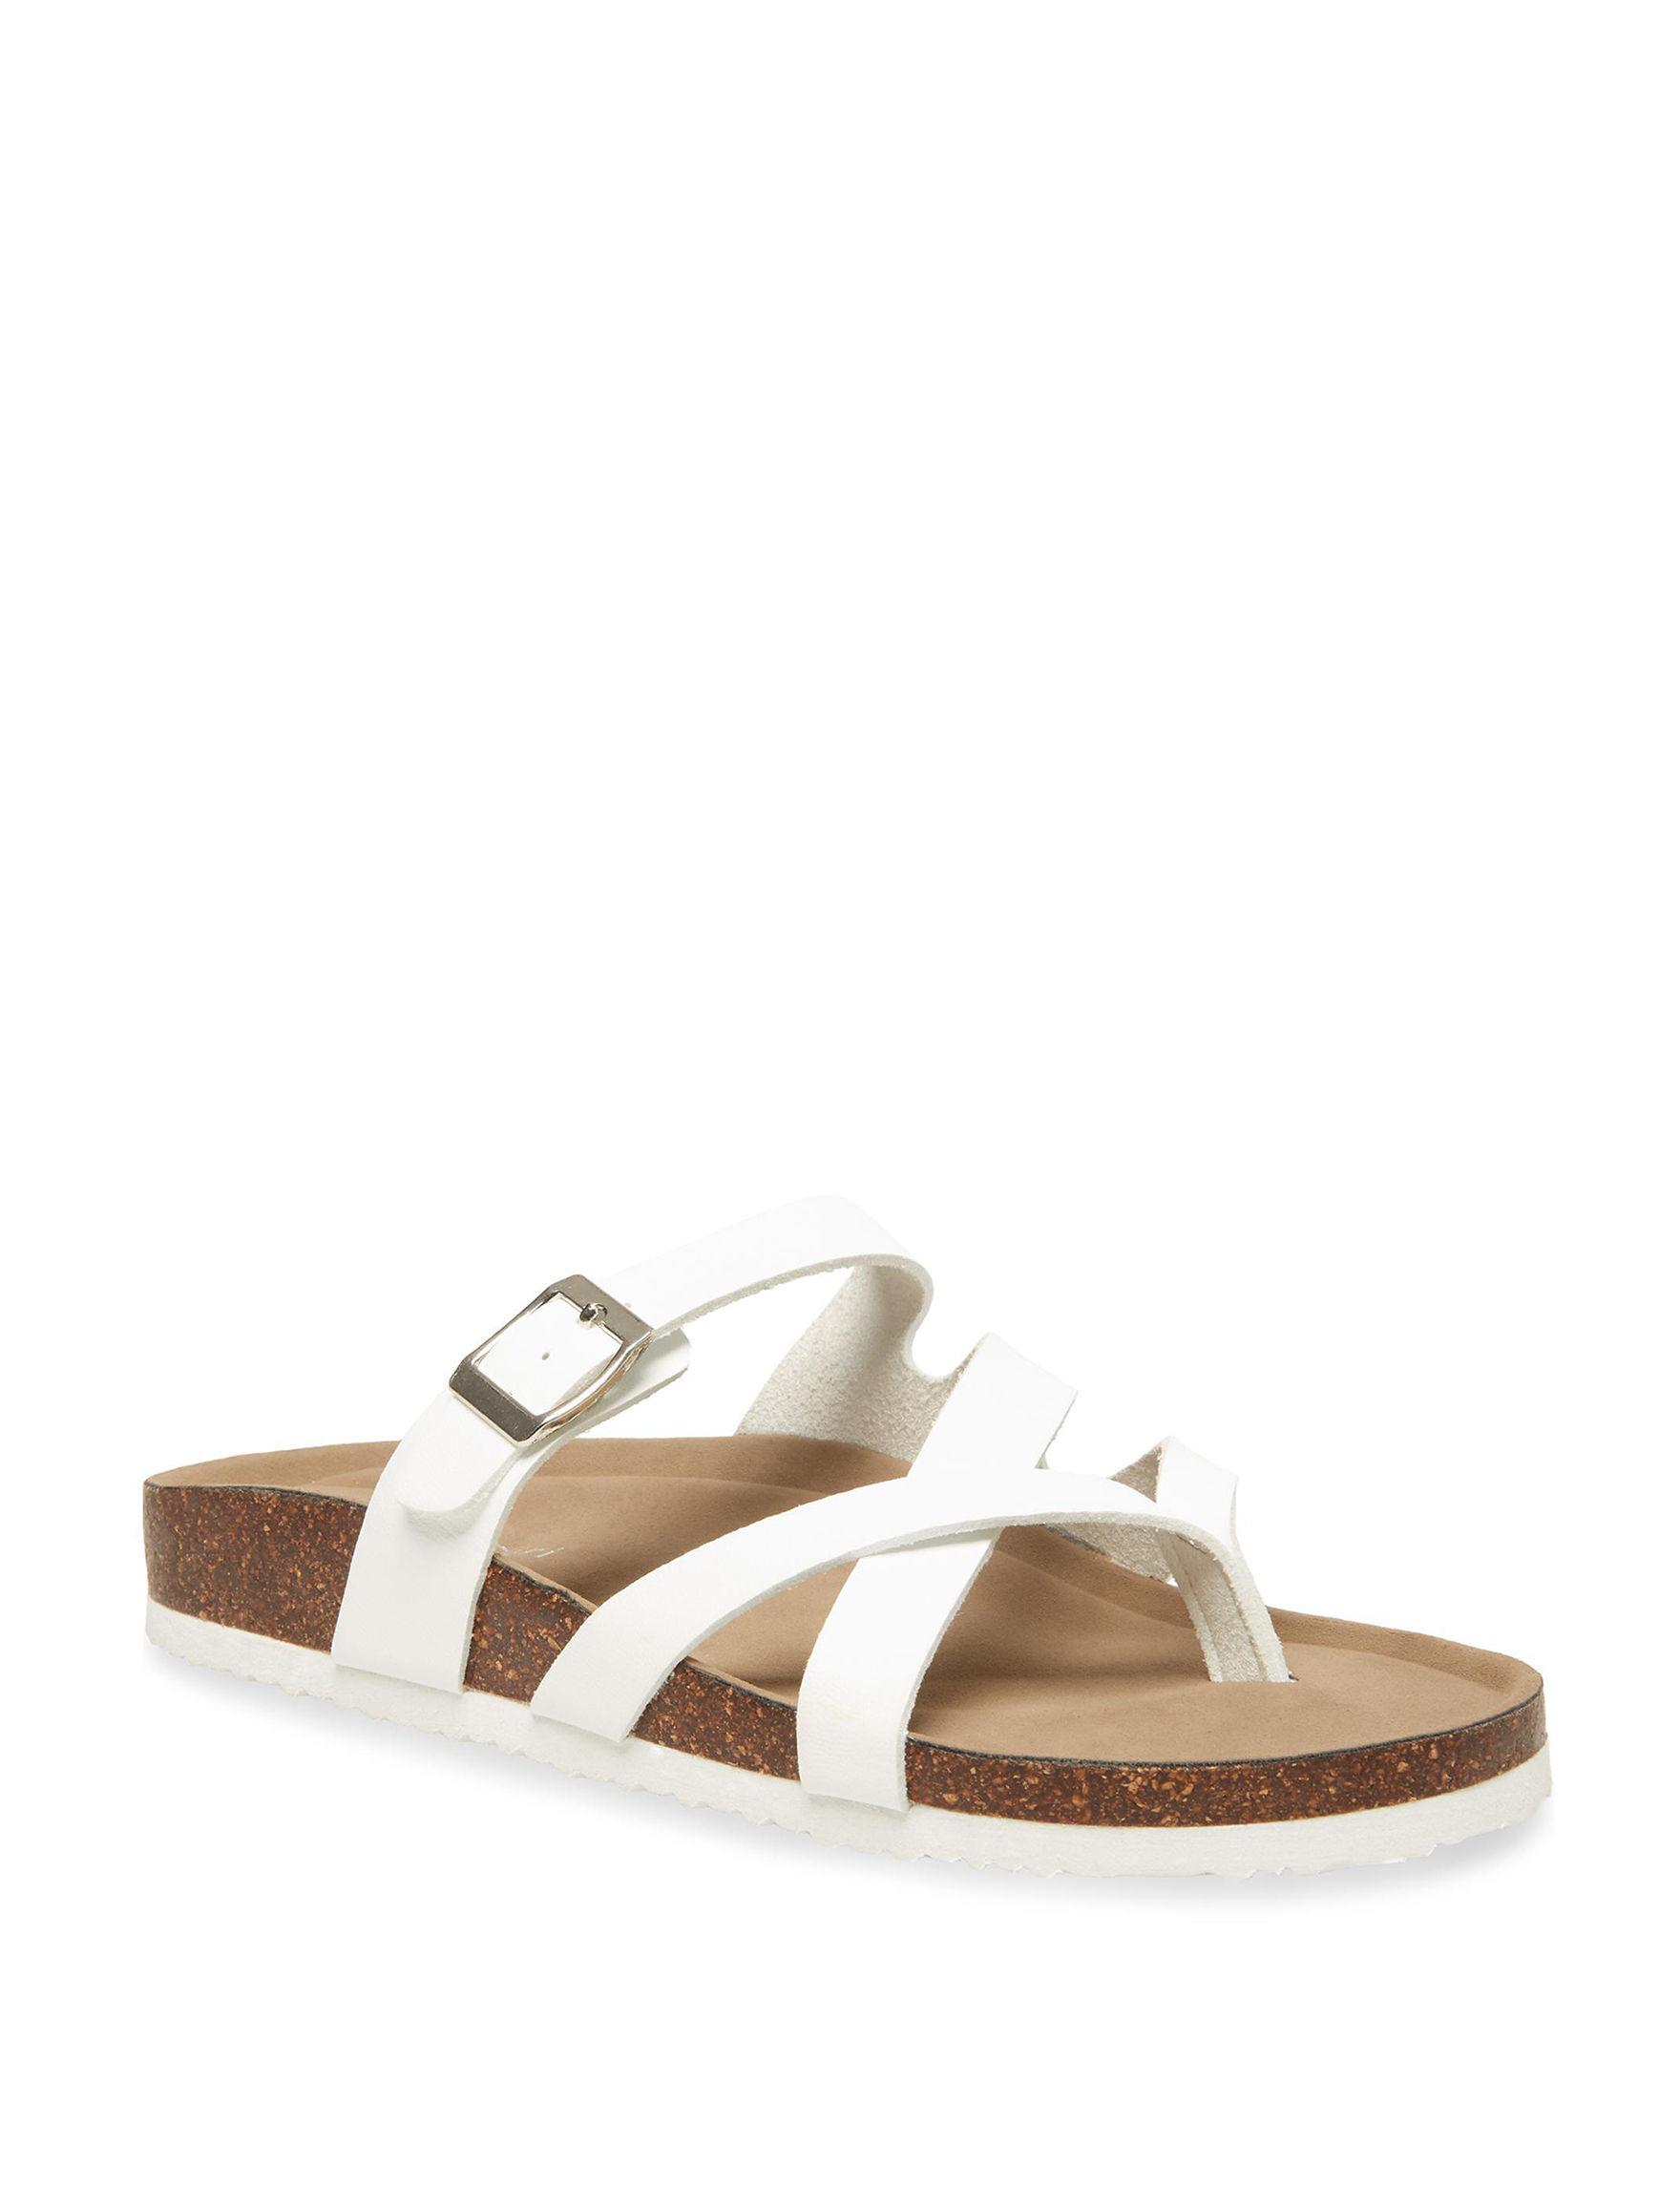 Madden Girl White Flat Sandals Footbed